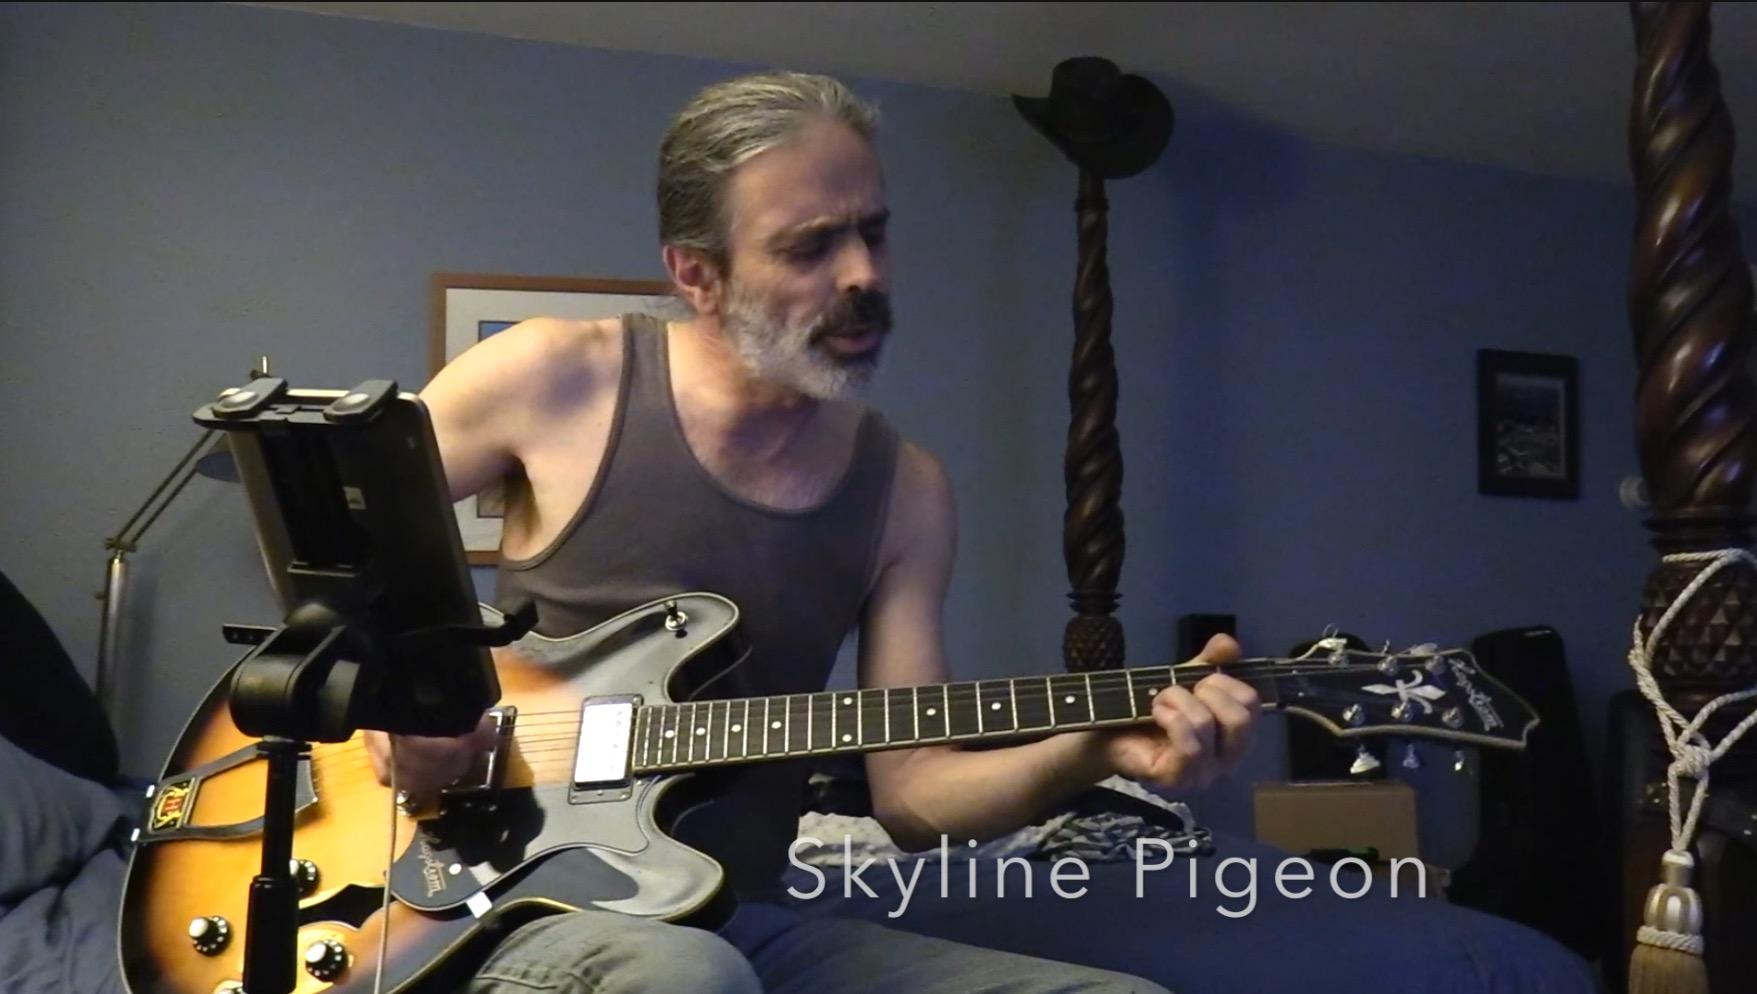 Mark Skyline Pigeon